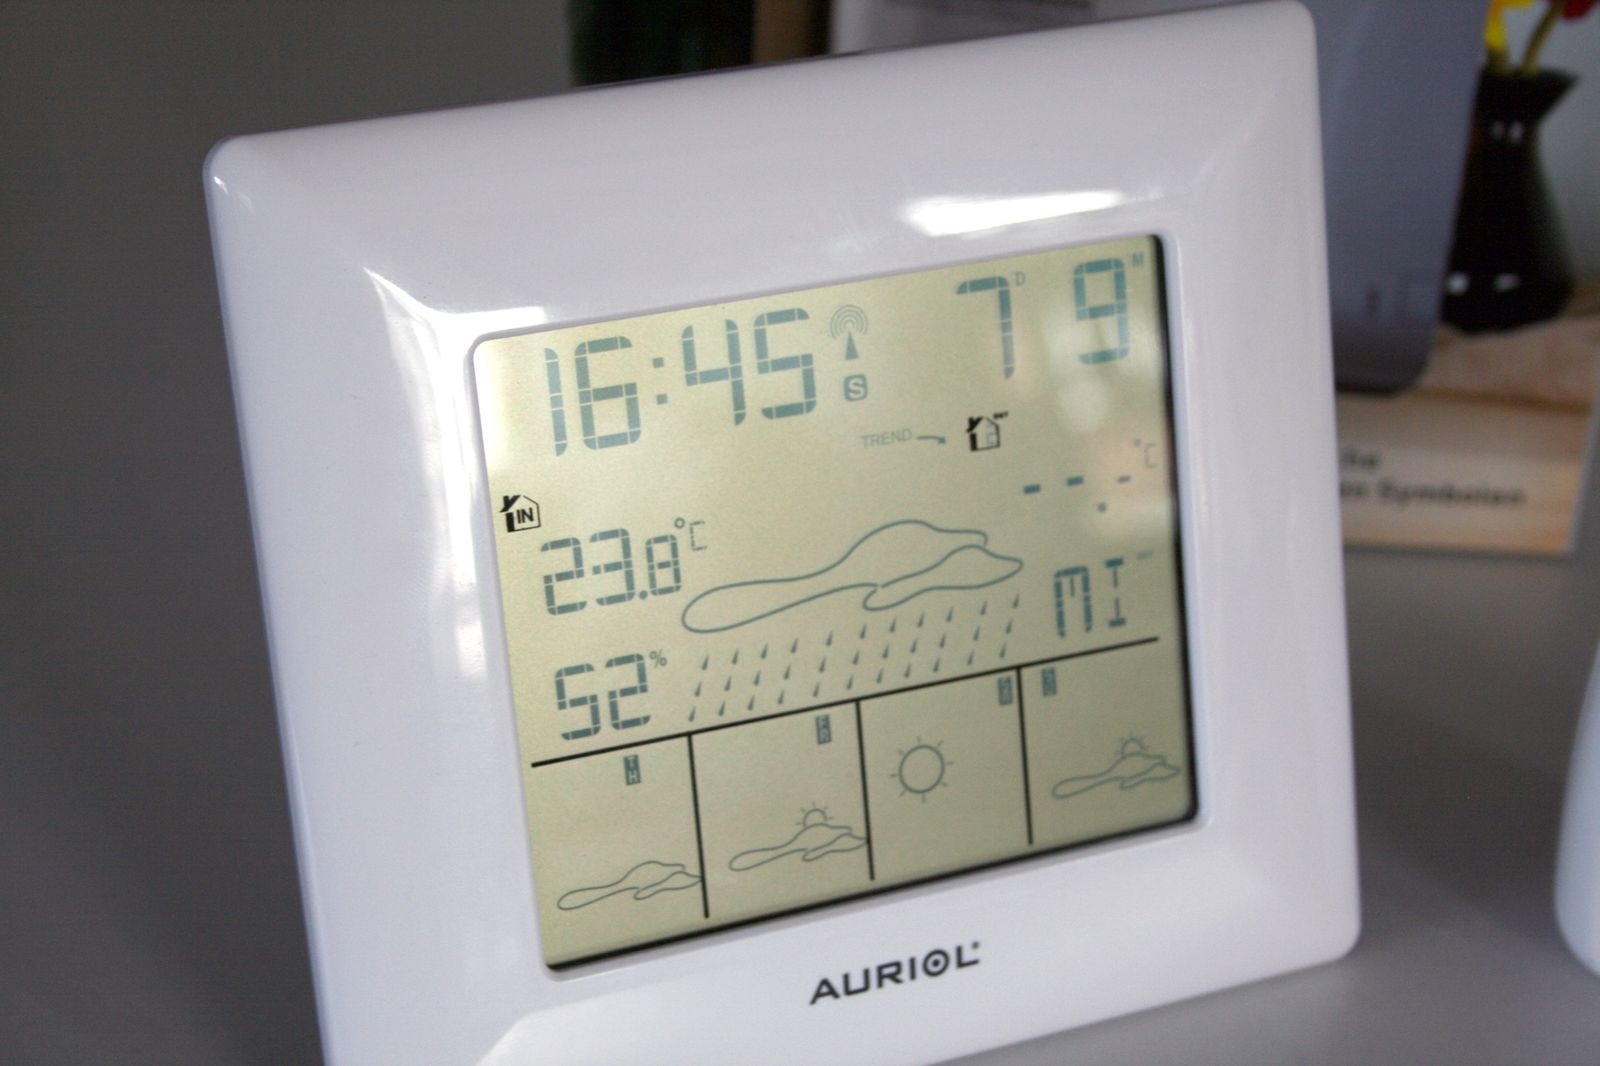 Wetterstation / Auriol / WISSENSCHAFT